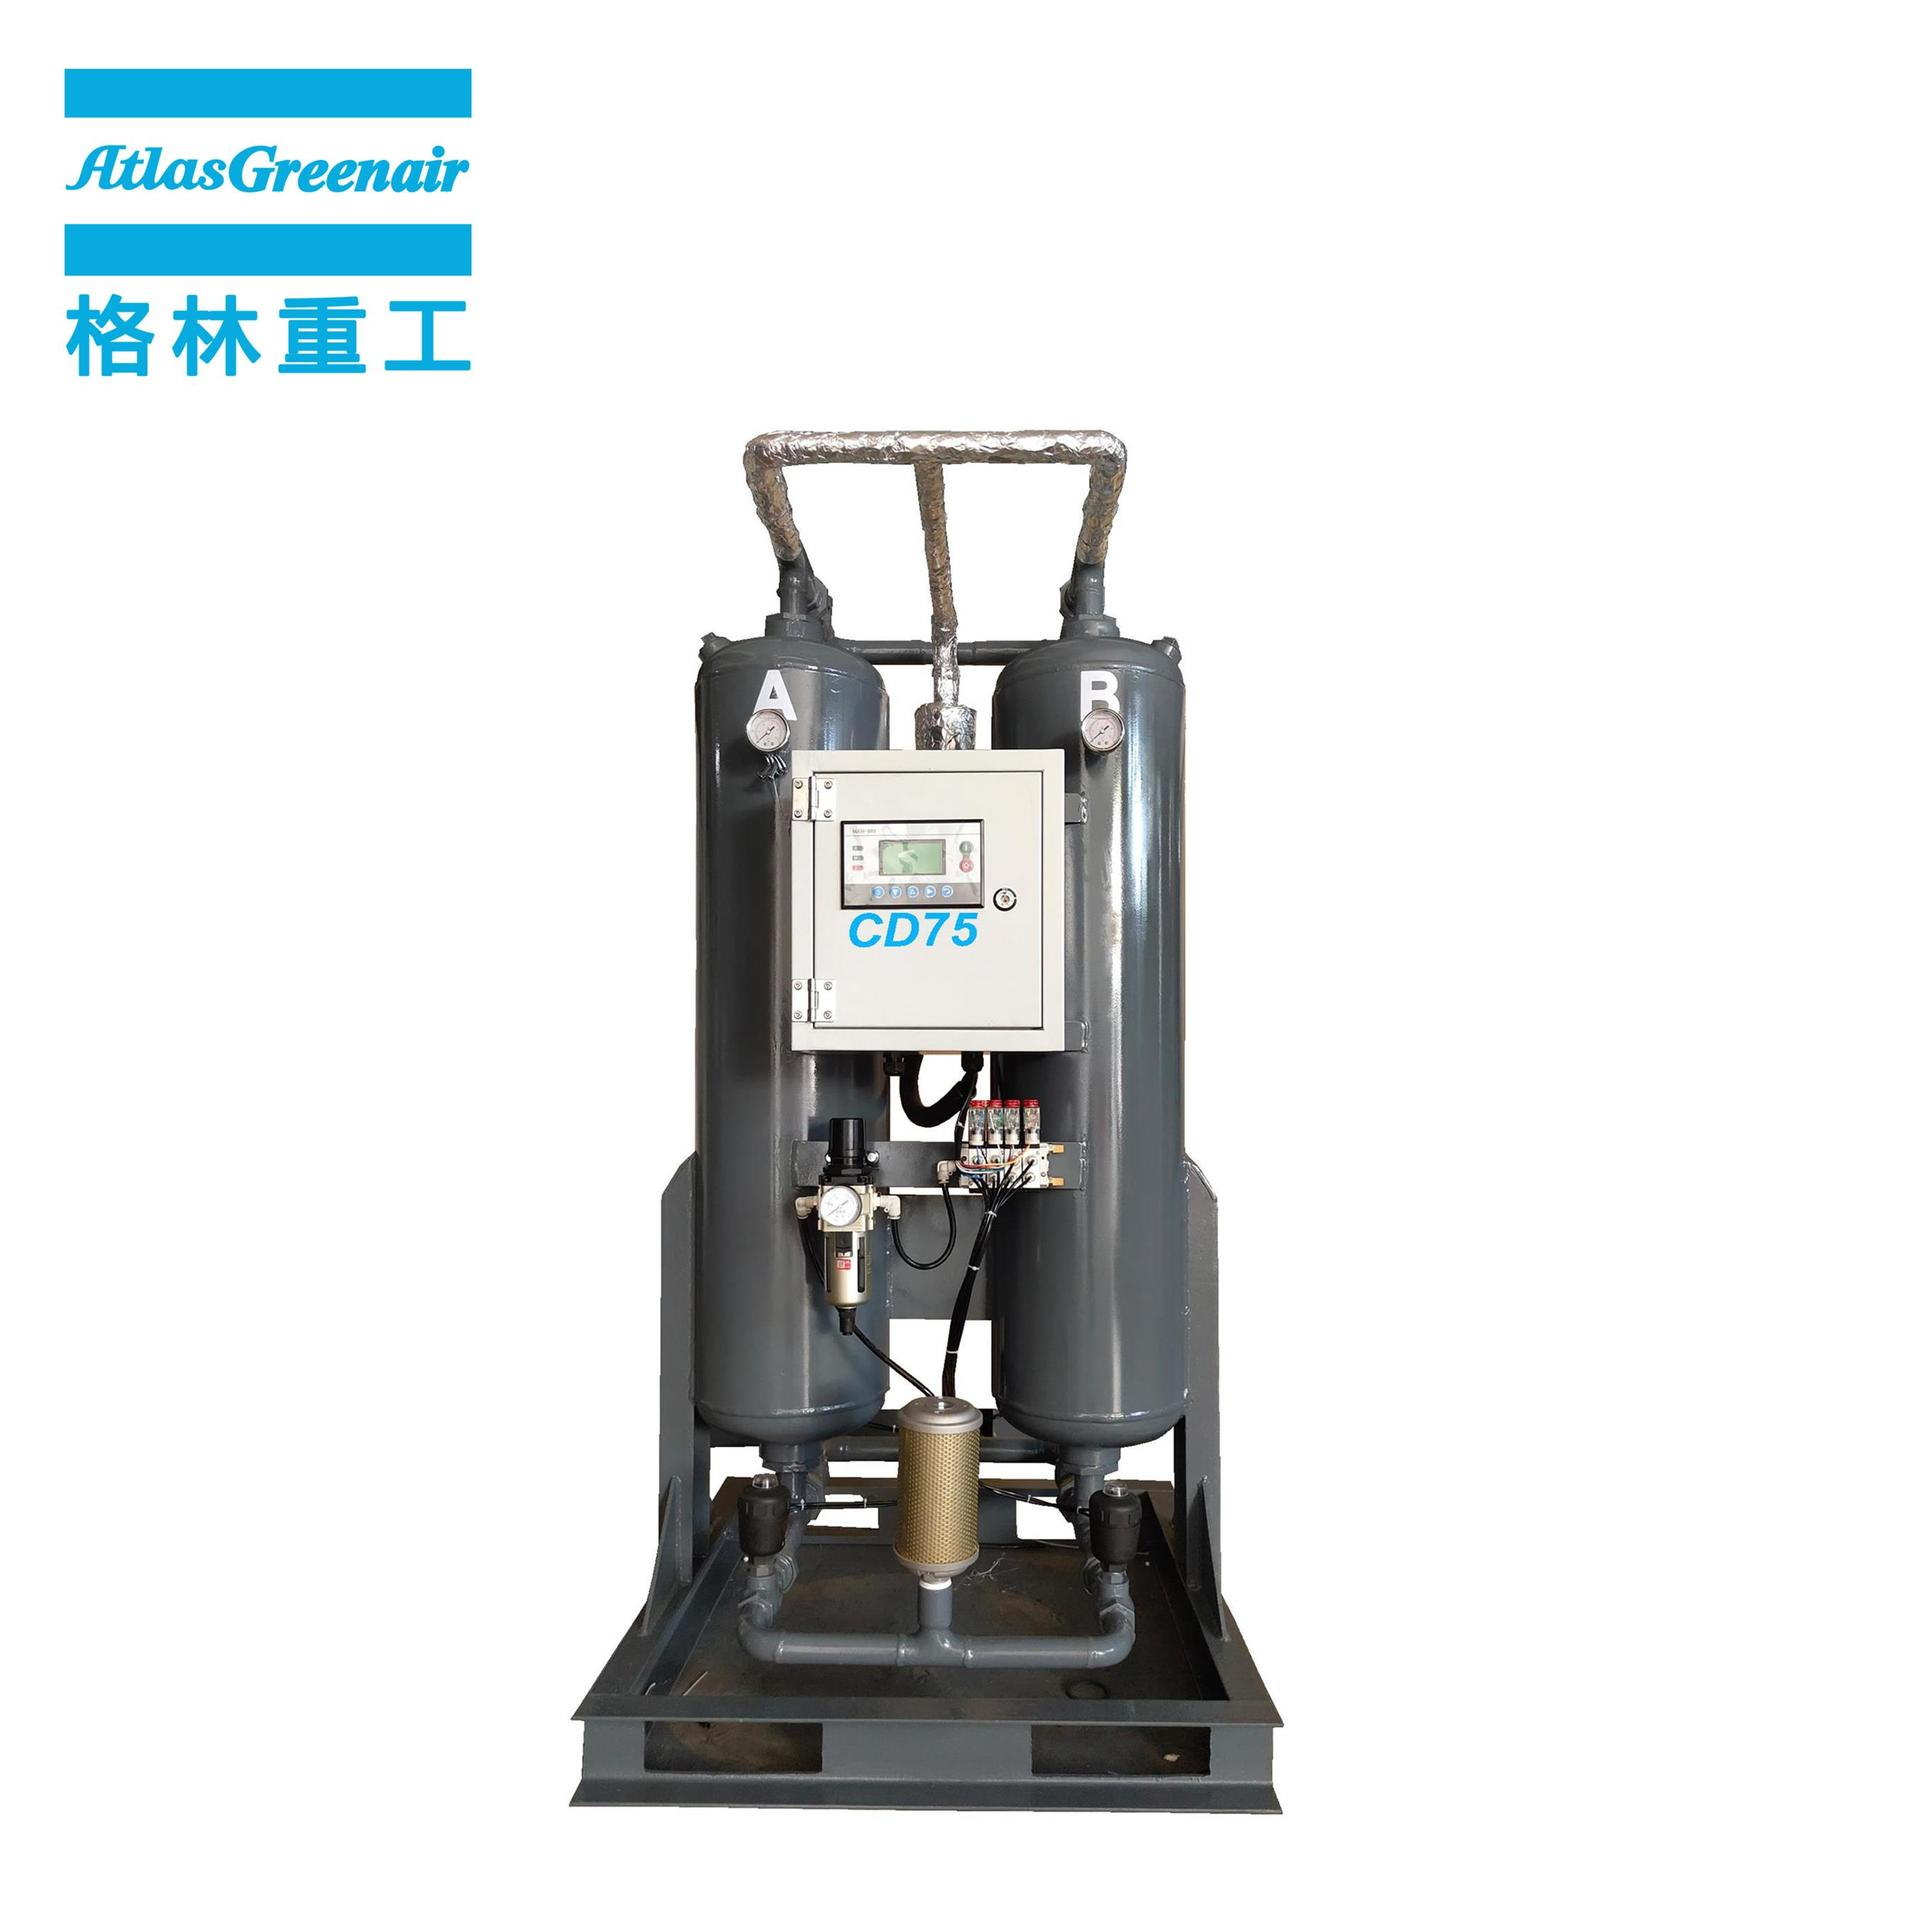 Atlas Greenair CD75 Adsorption Air Dryer Compressed Air Dryer